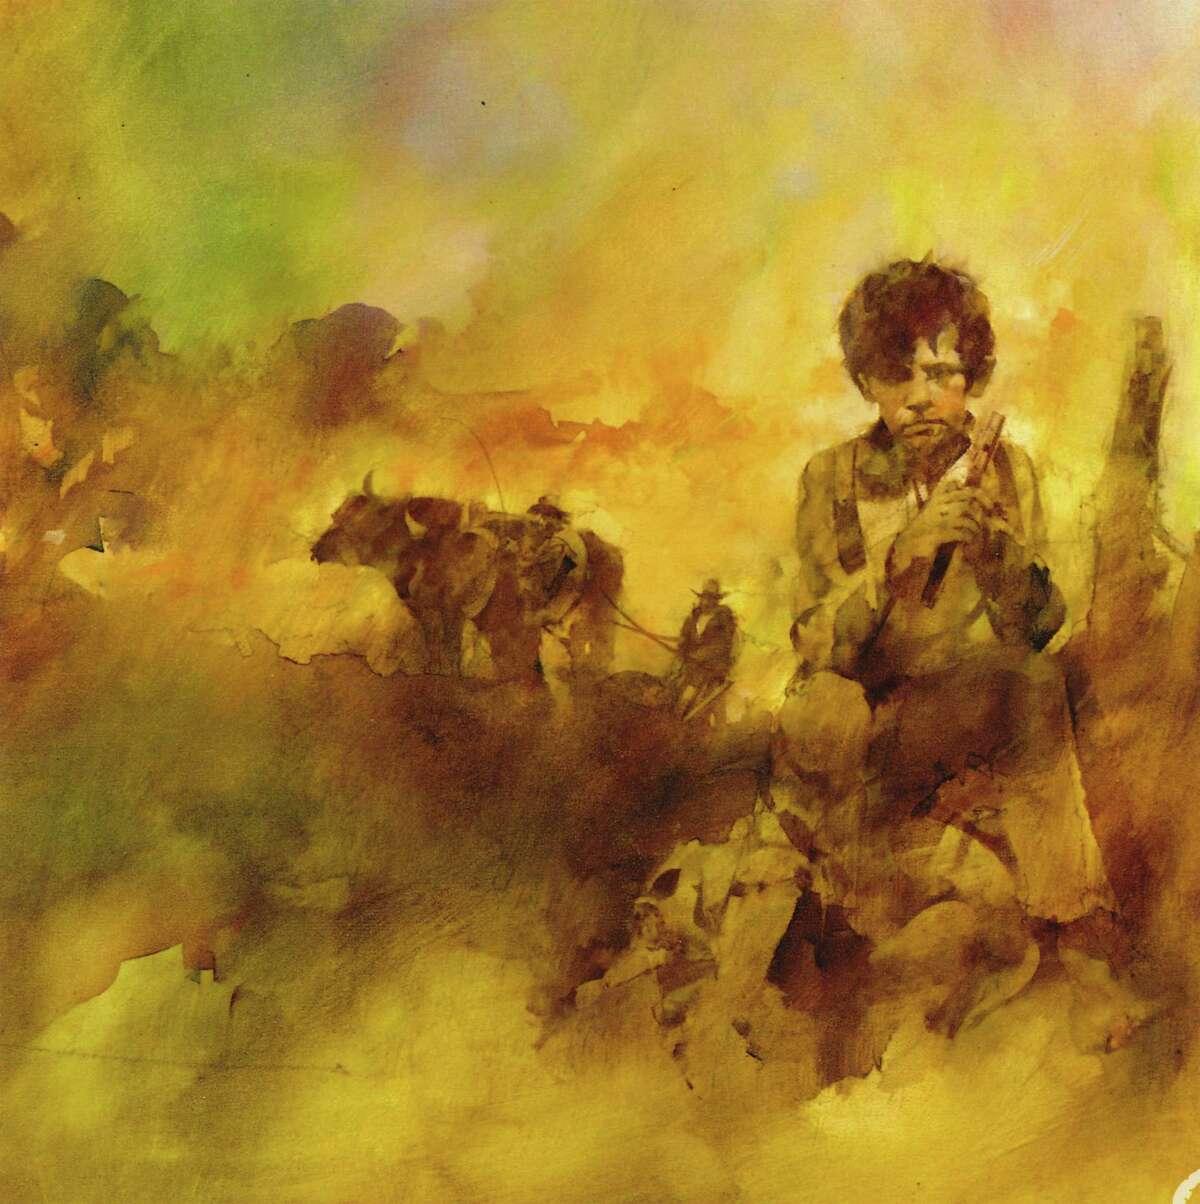 Bob Crofut published a book featuring decades of his art.